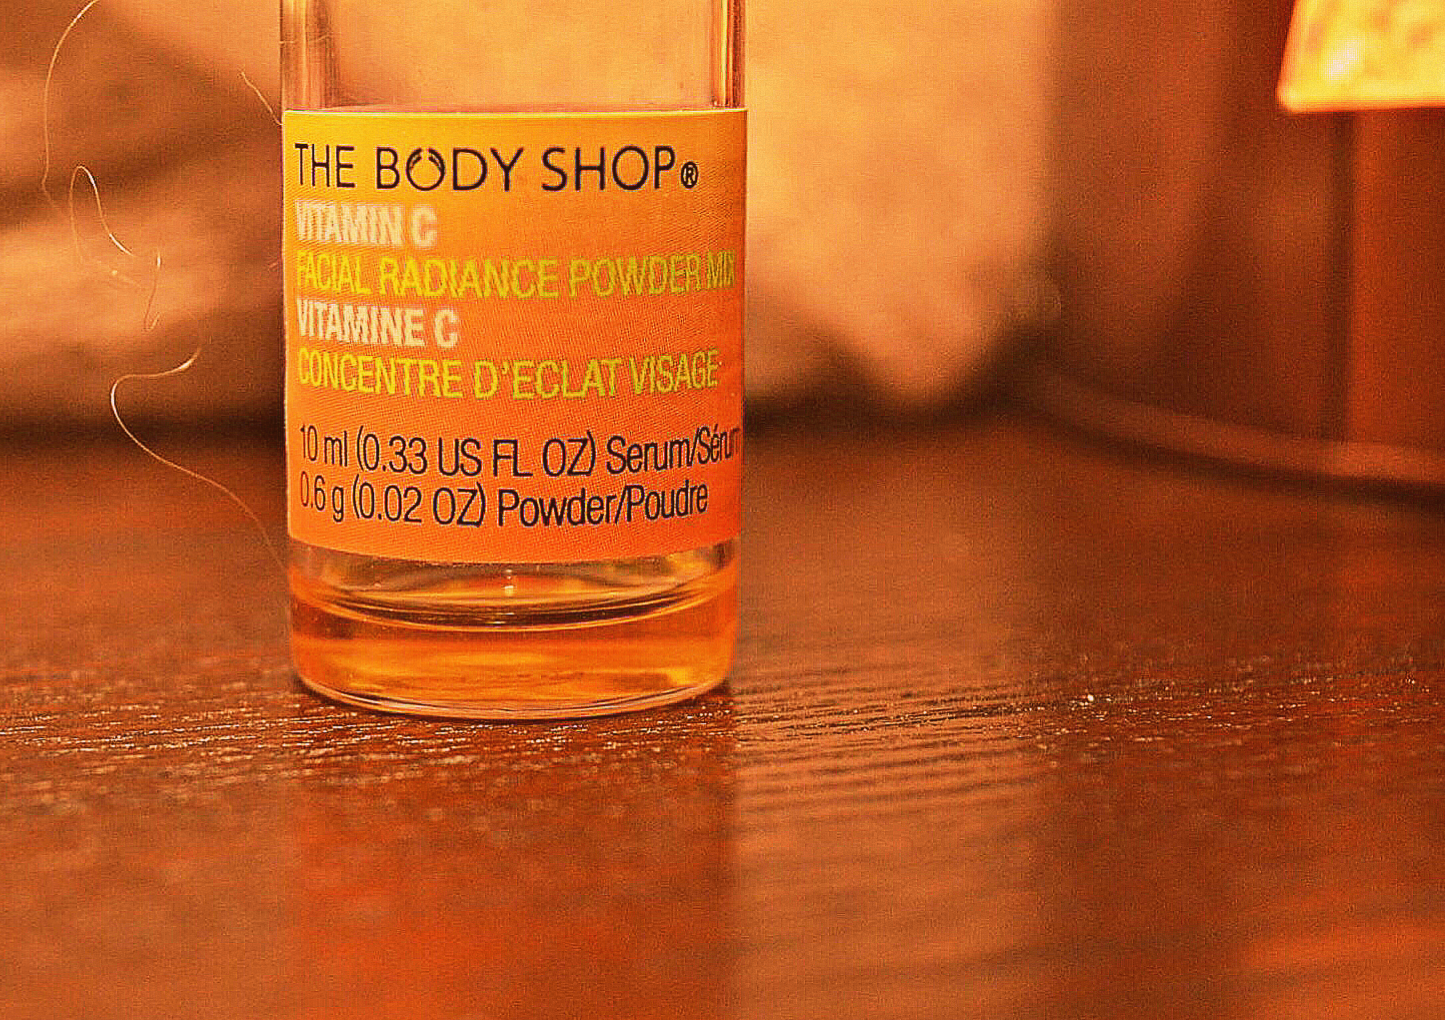 img 8441 - Vitamin C Skin Care Body Shop Review